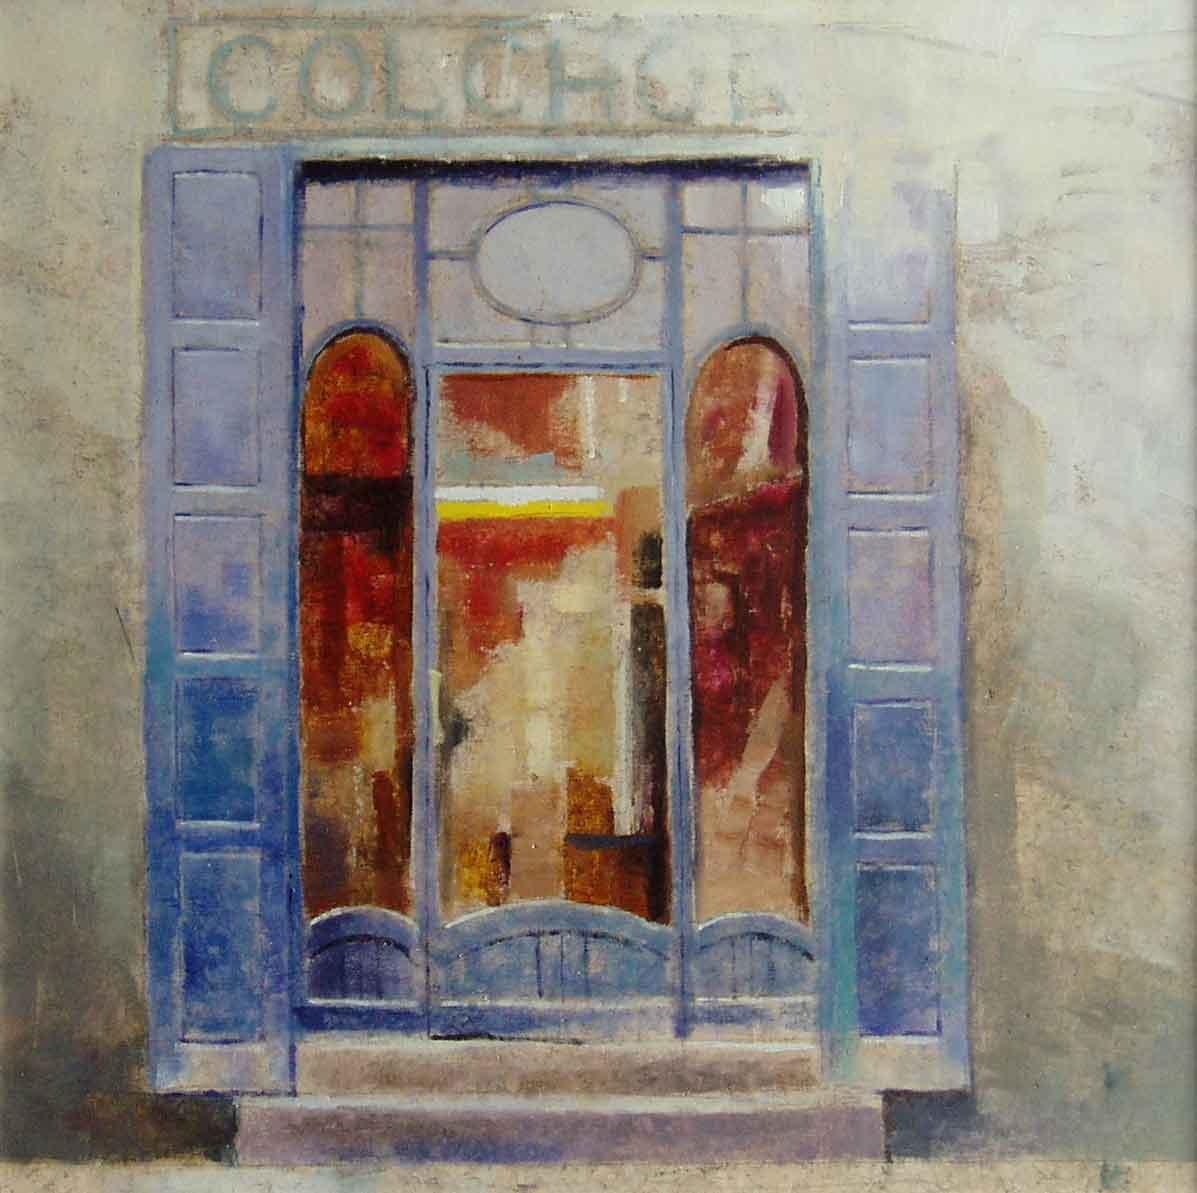 Shop Windows Barcelona ( Edition of 195 )